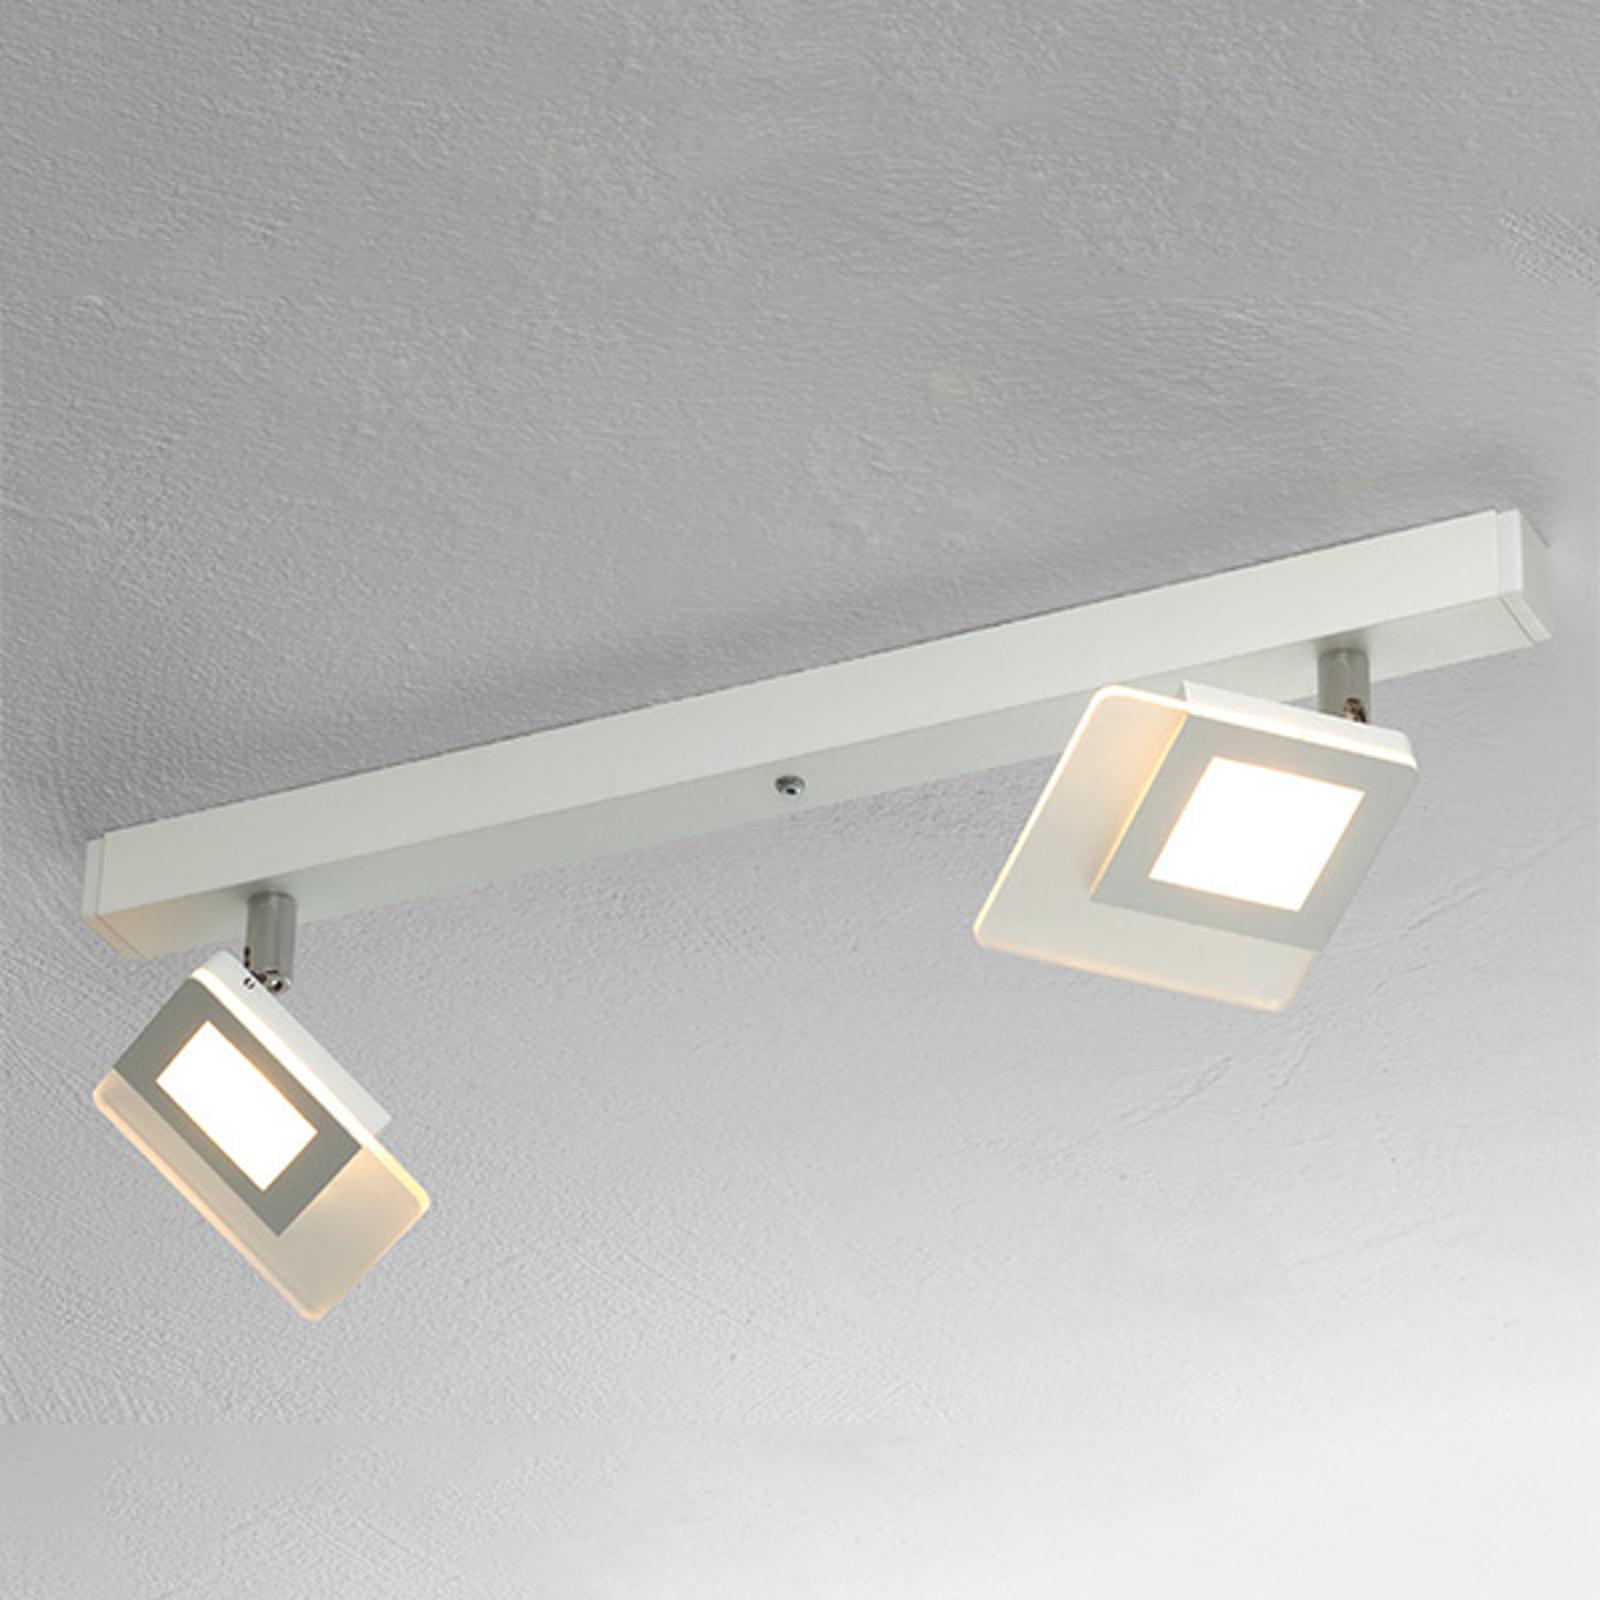 Bella plafoniera LED bianca Line a 2 punti luce